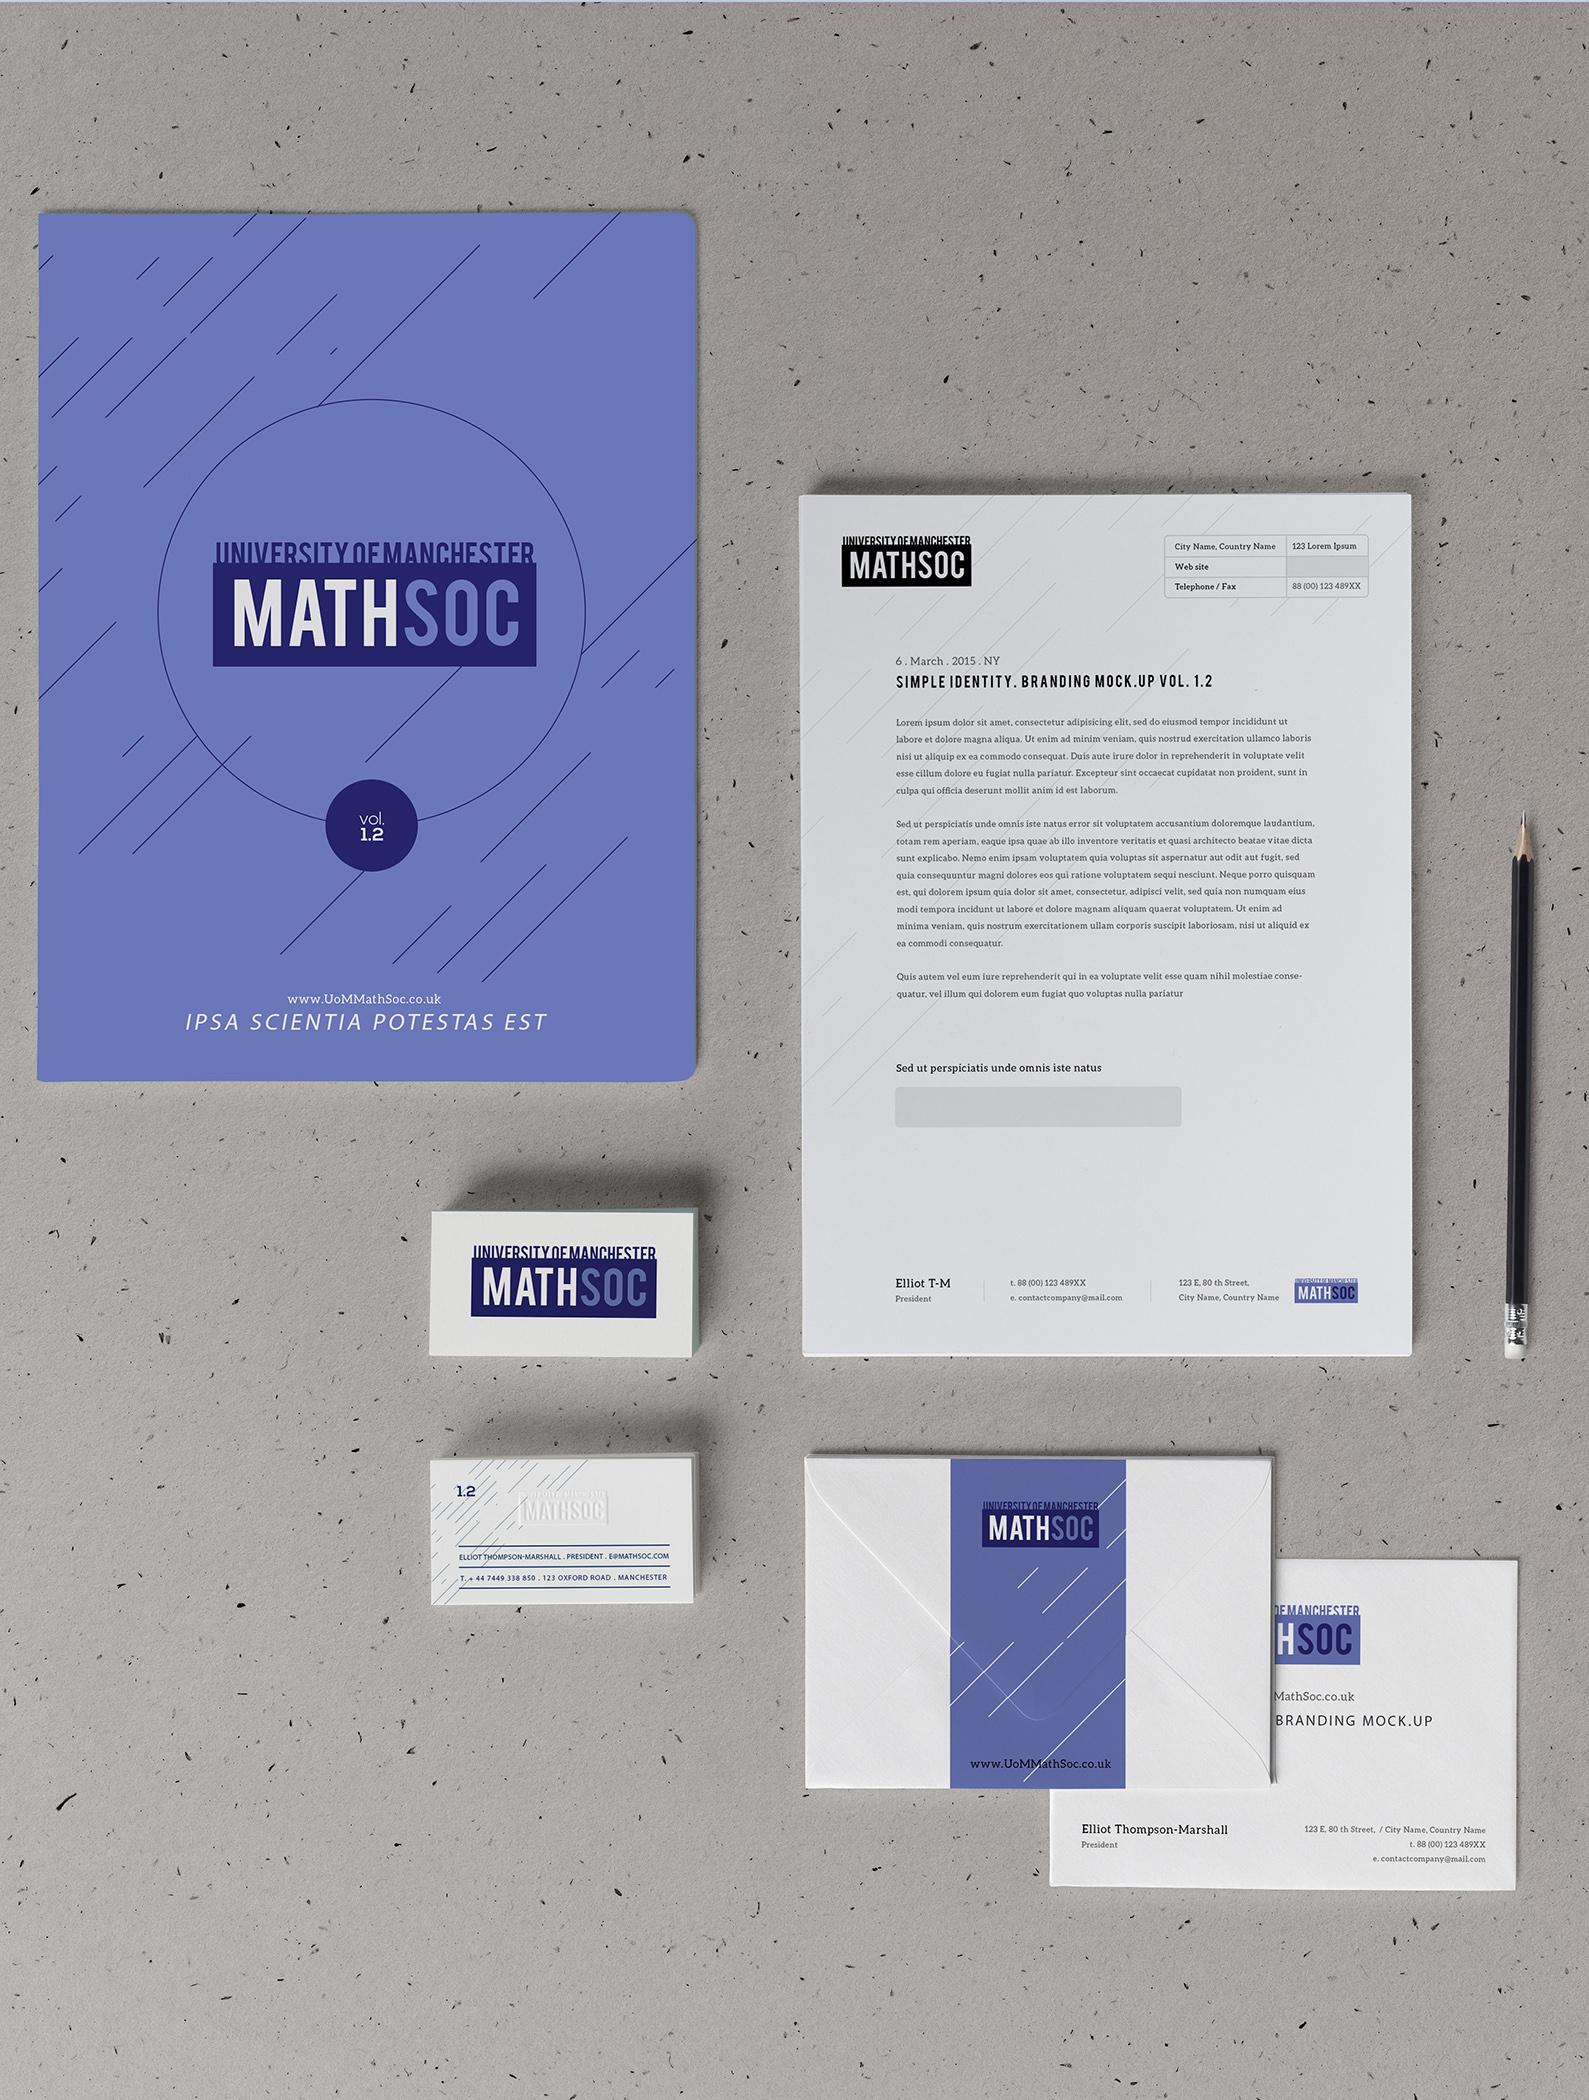 Math Soc Above Mock Up.jpg